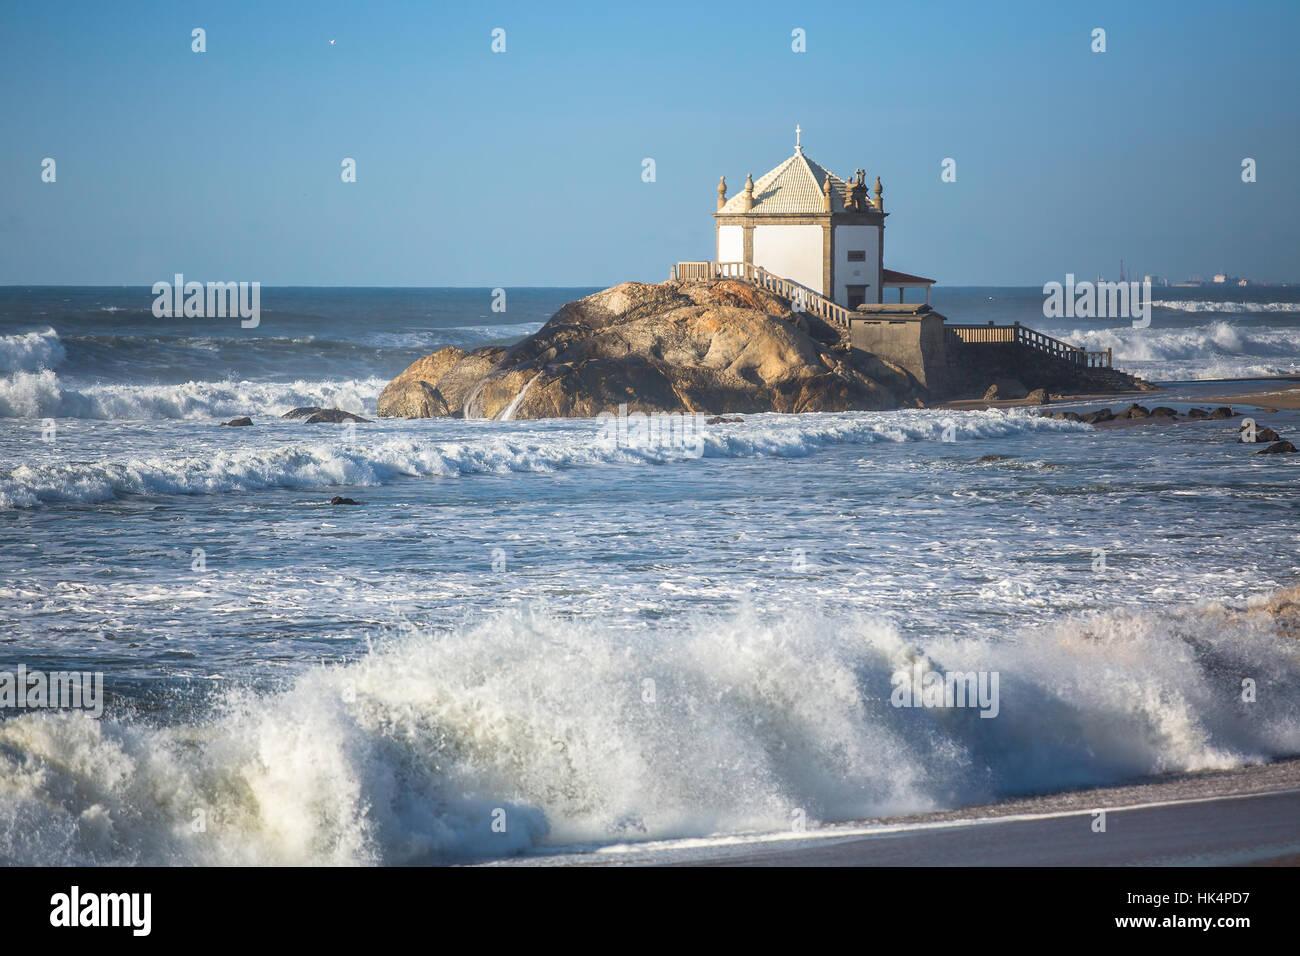 Ocean surf and Chapel Senhor da Pedra at Miramar Beach, near Porto, Portugal. - Stock Image